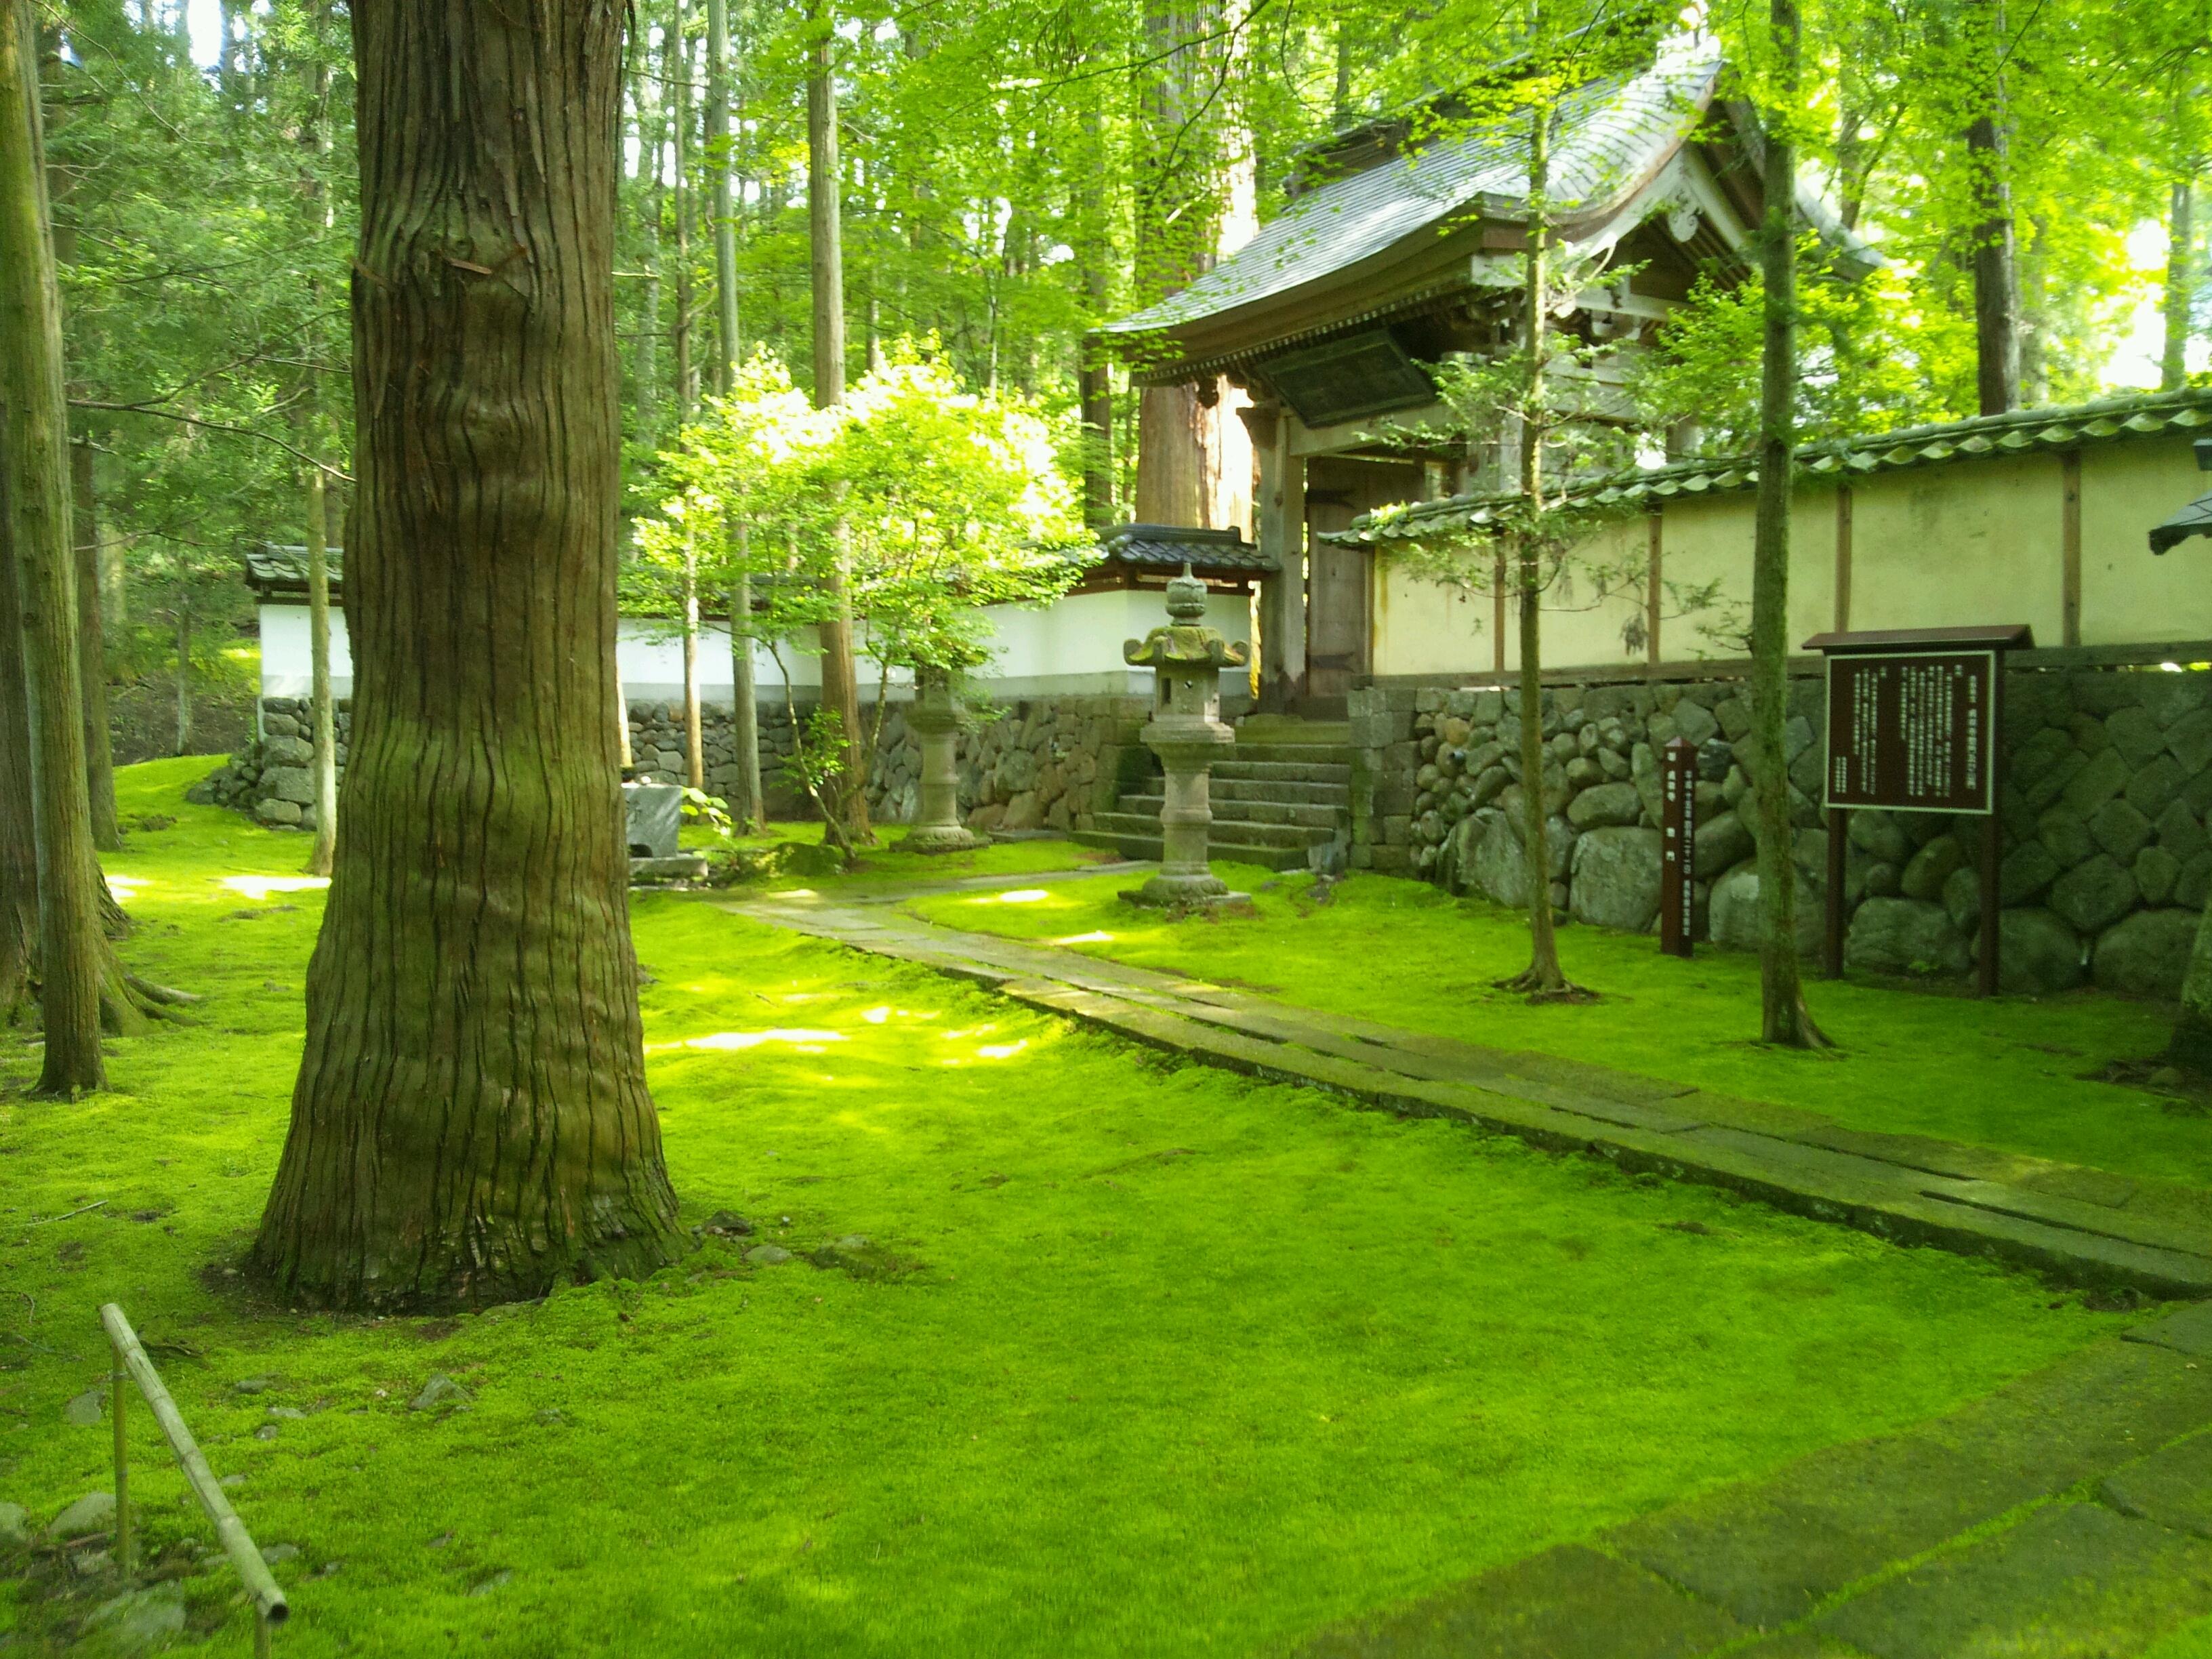 http://www.sakukankou.jp/MT/mtblog/sightseeing/teisyouzi.jpg